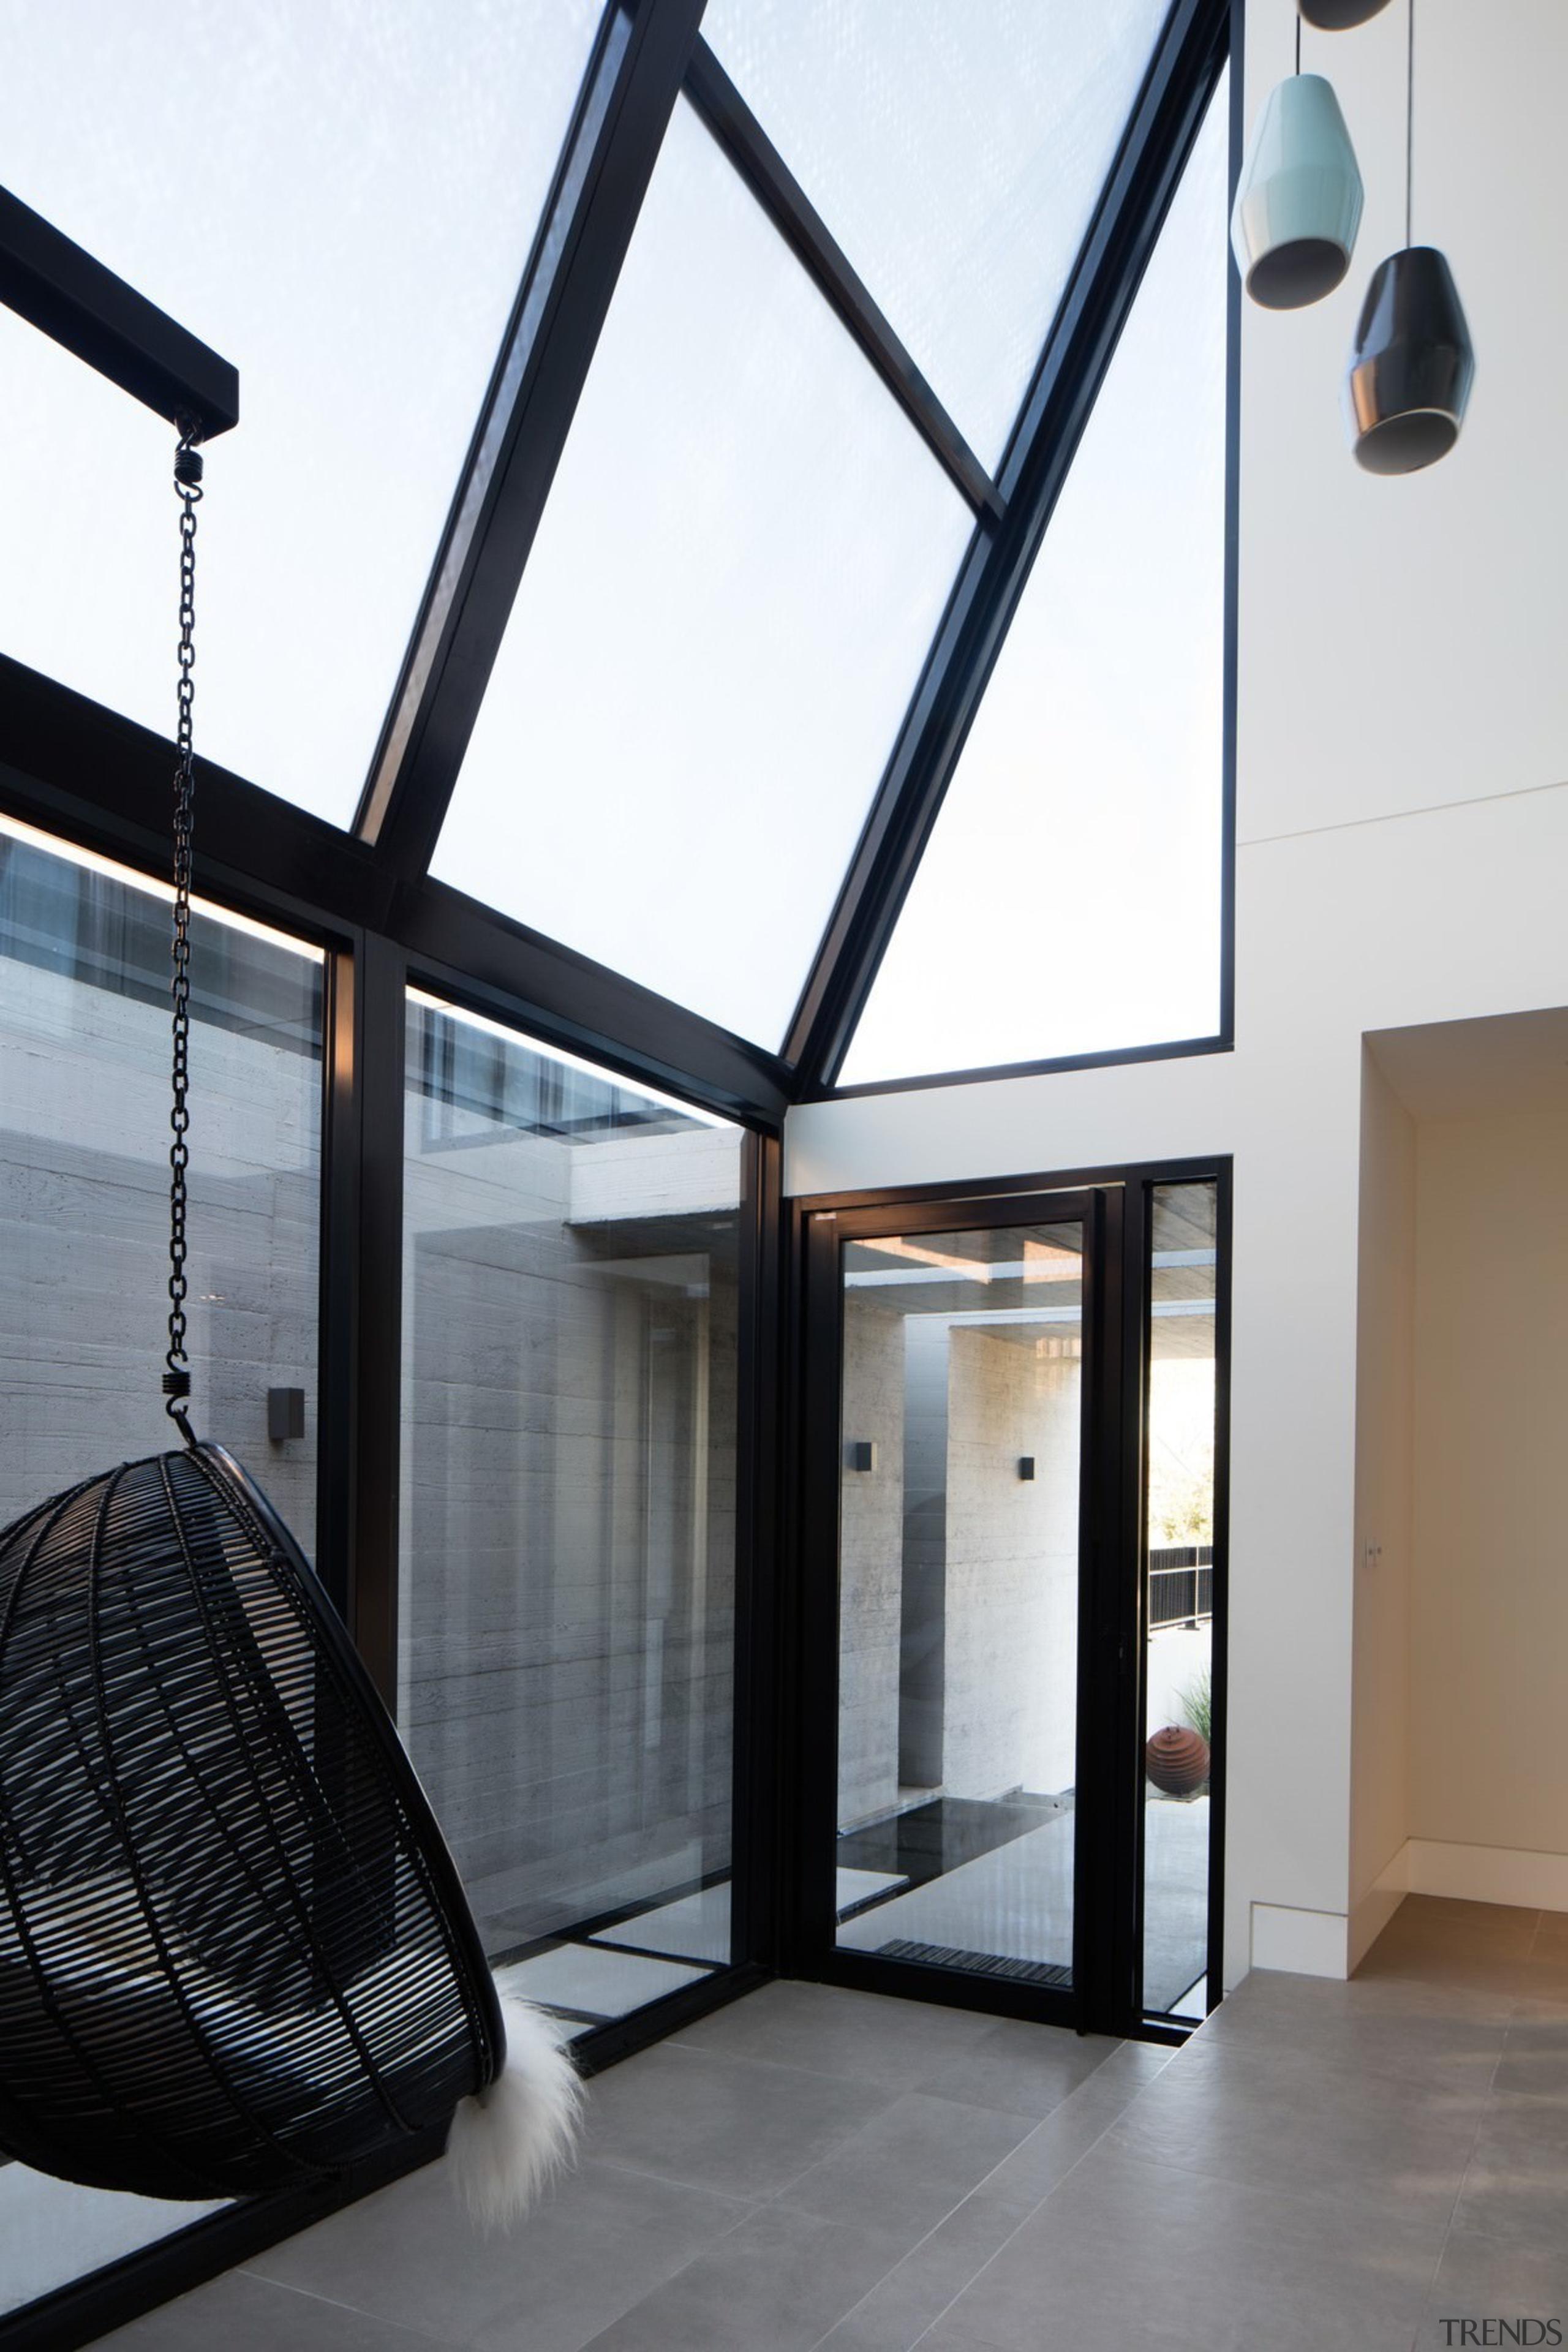 Architect: Damon HillsPhotography by Nic Granleese architecture, building, daylighting, glass, house, lighting, window, white